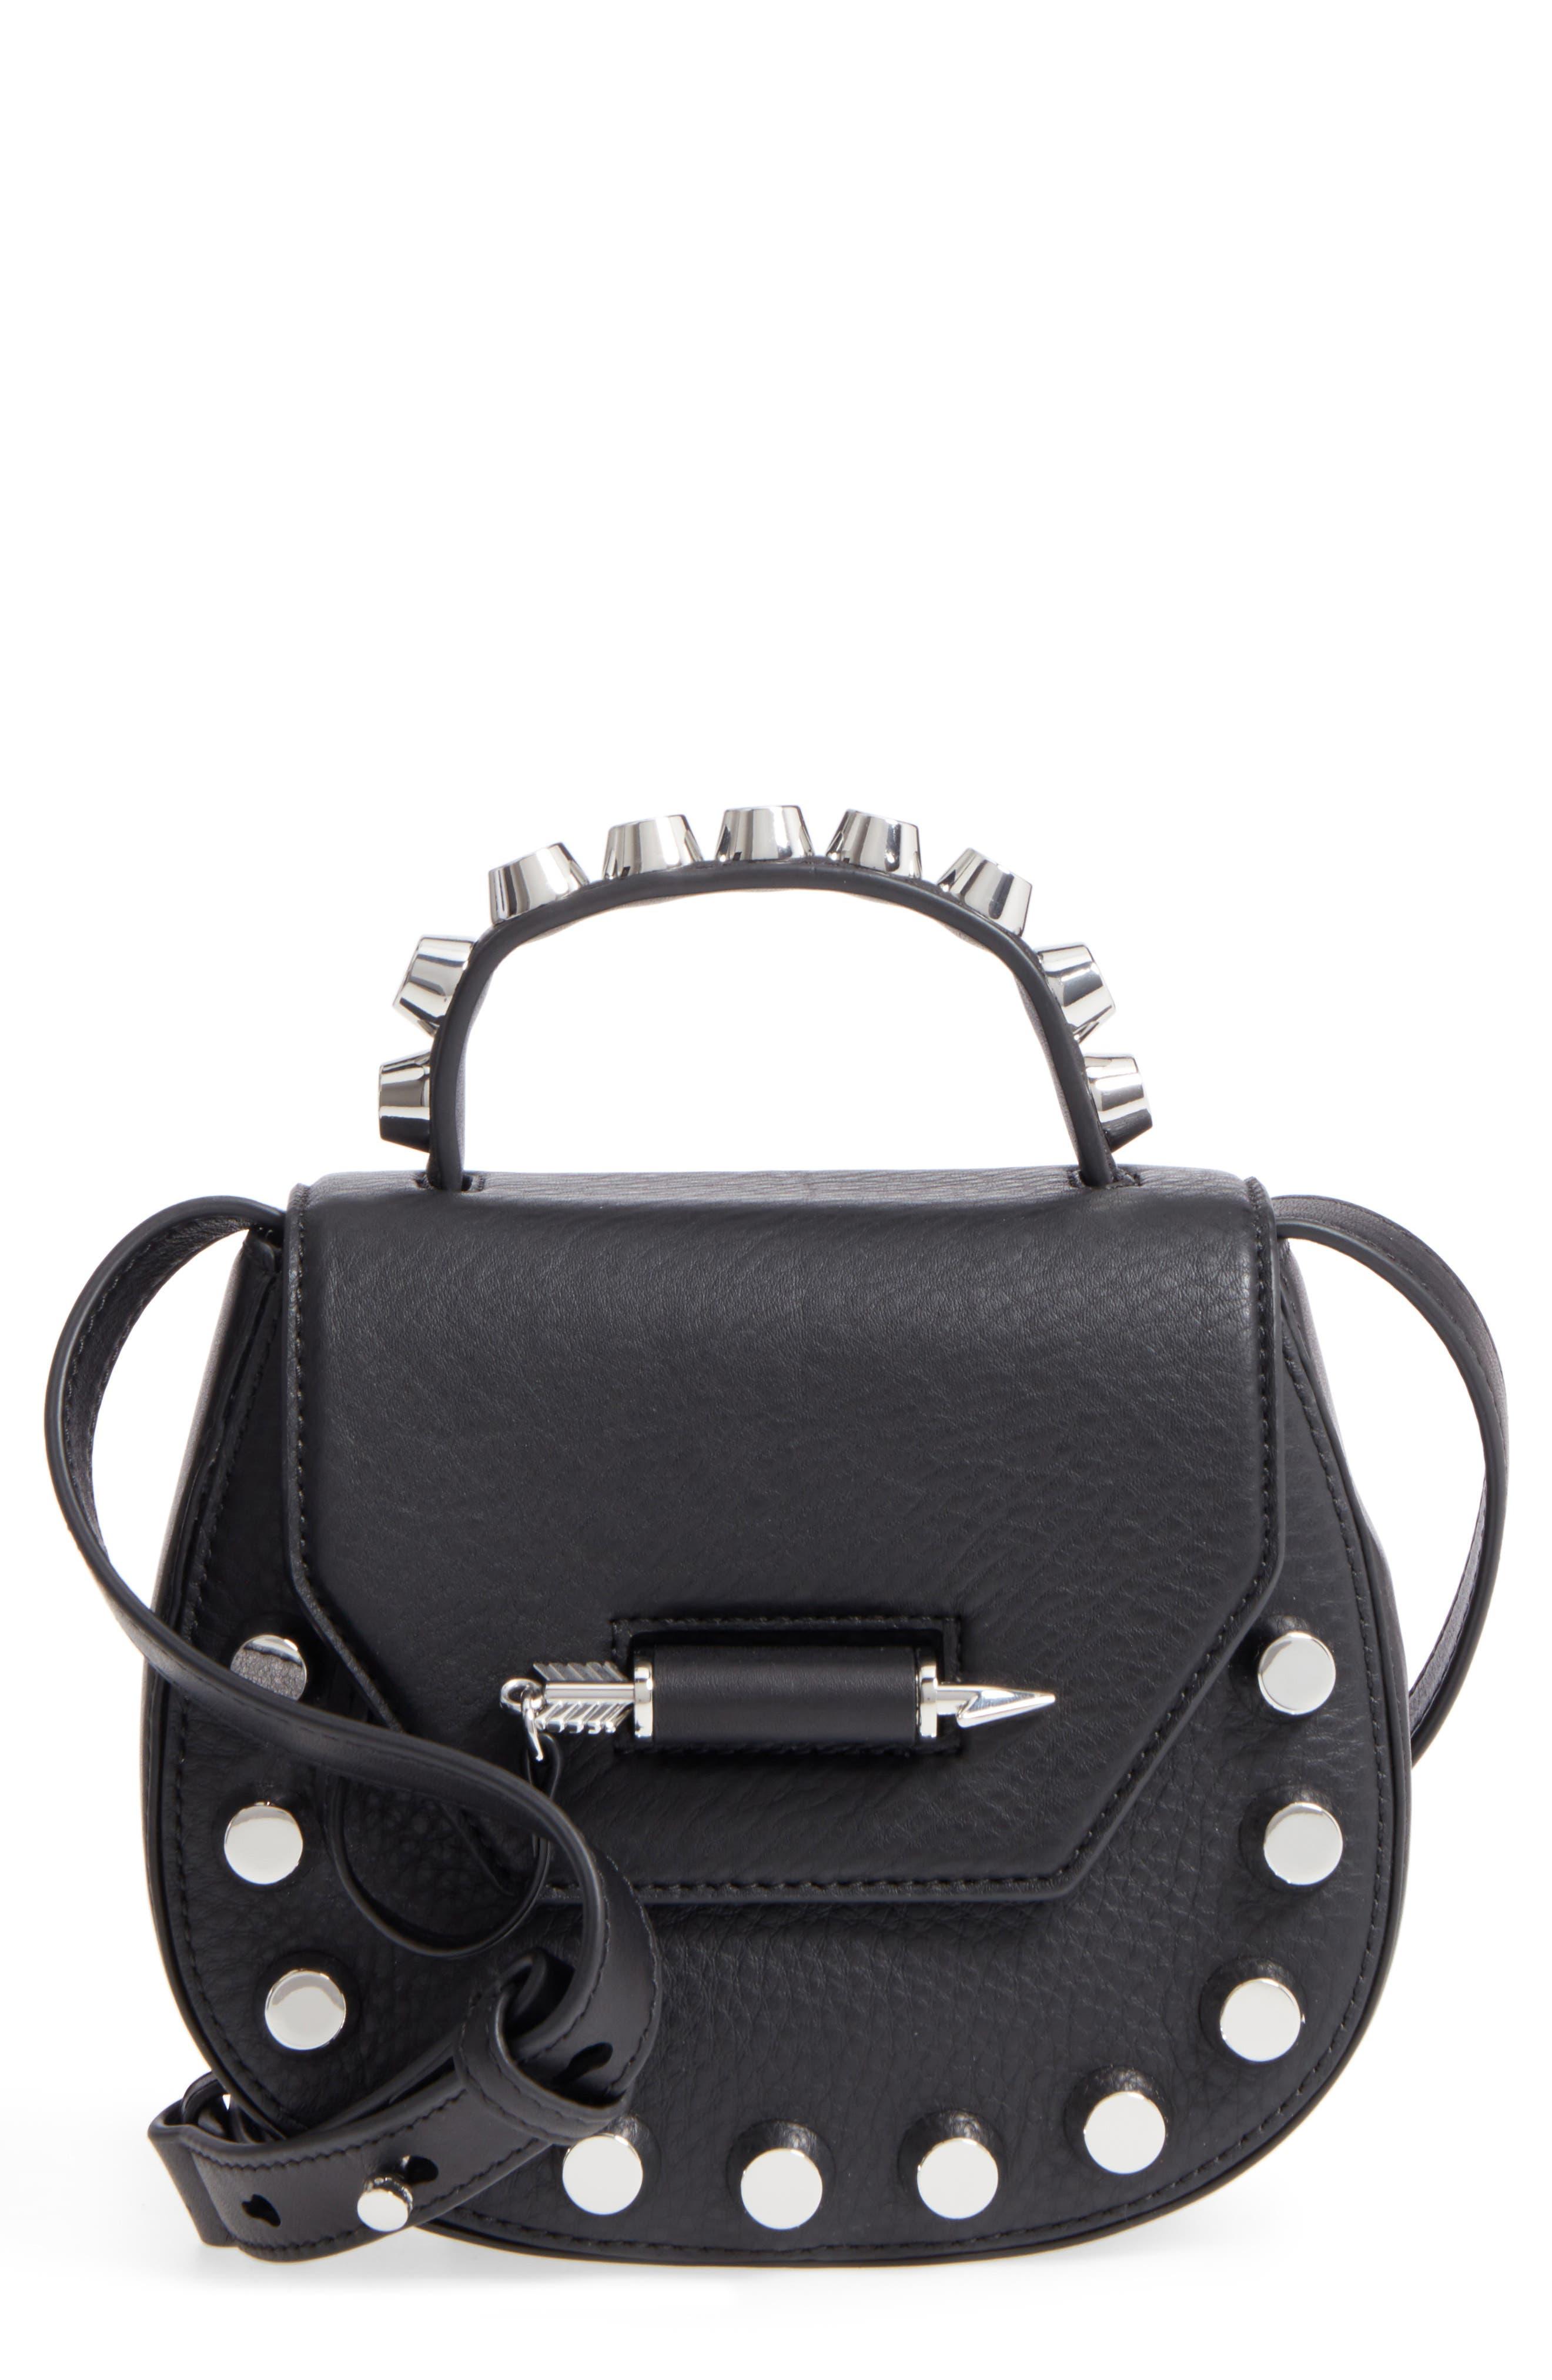 Main Image - Mackage Wilma Studded Leather Crossbody Bag